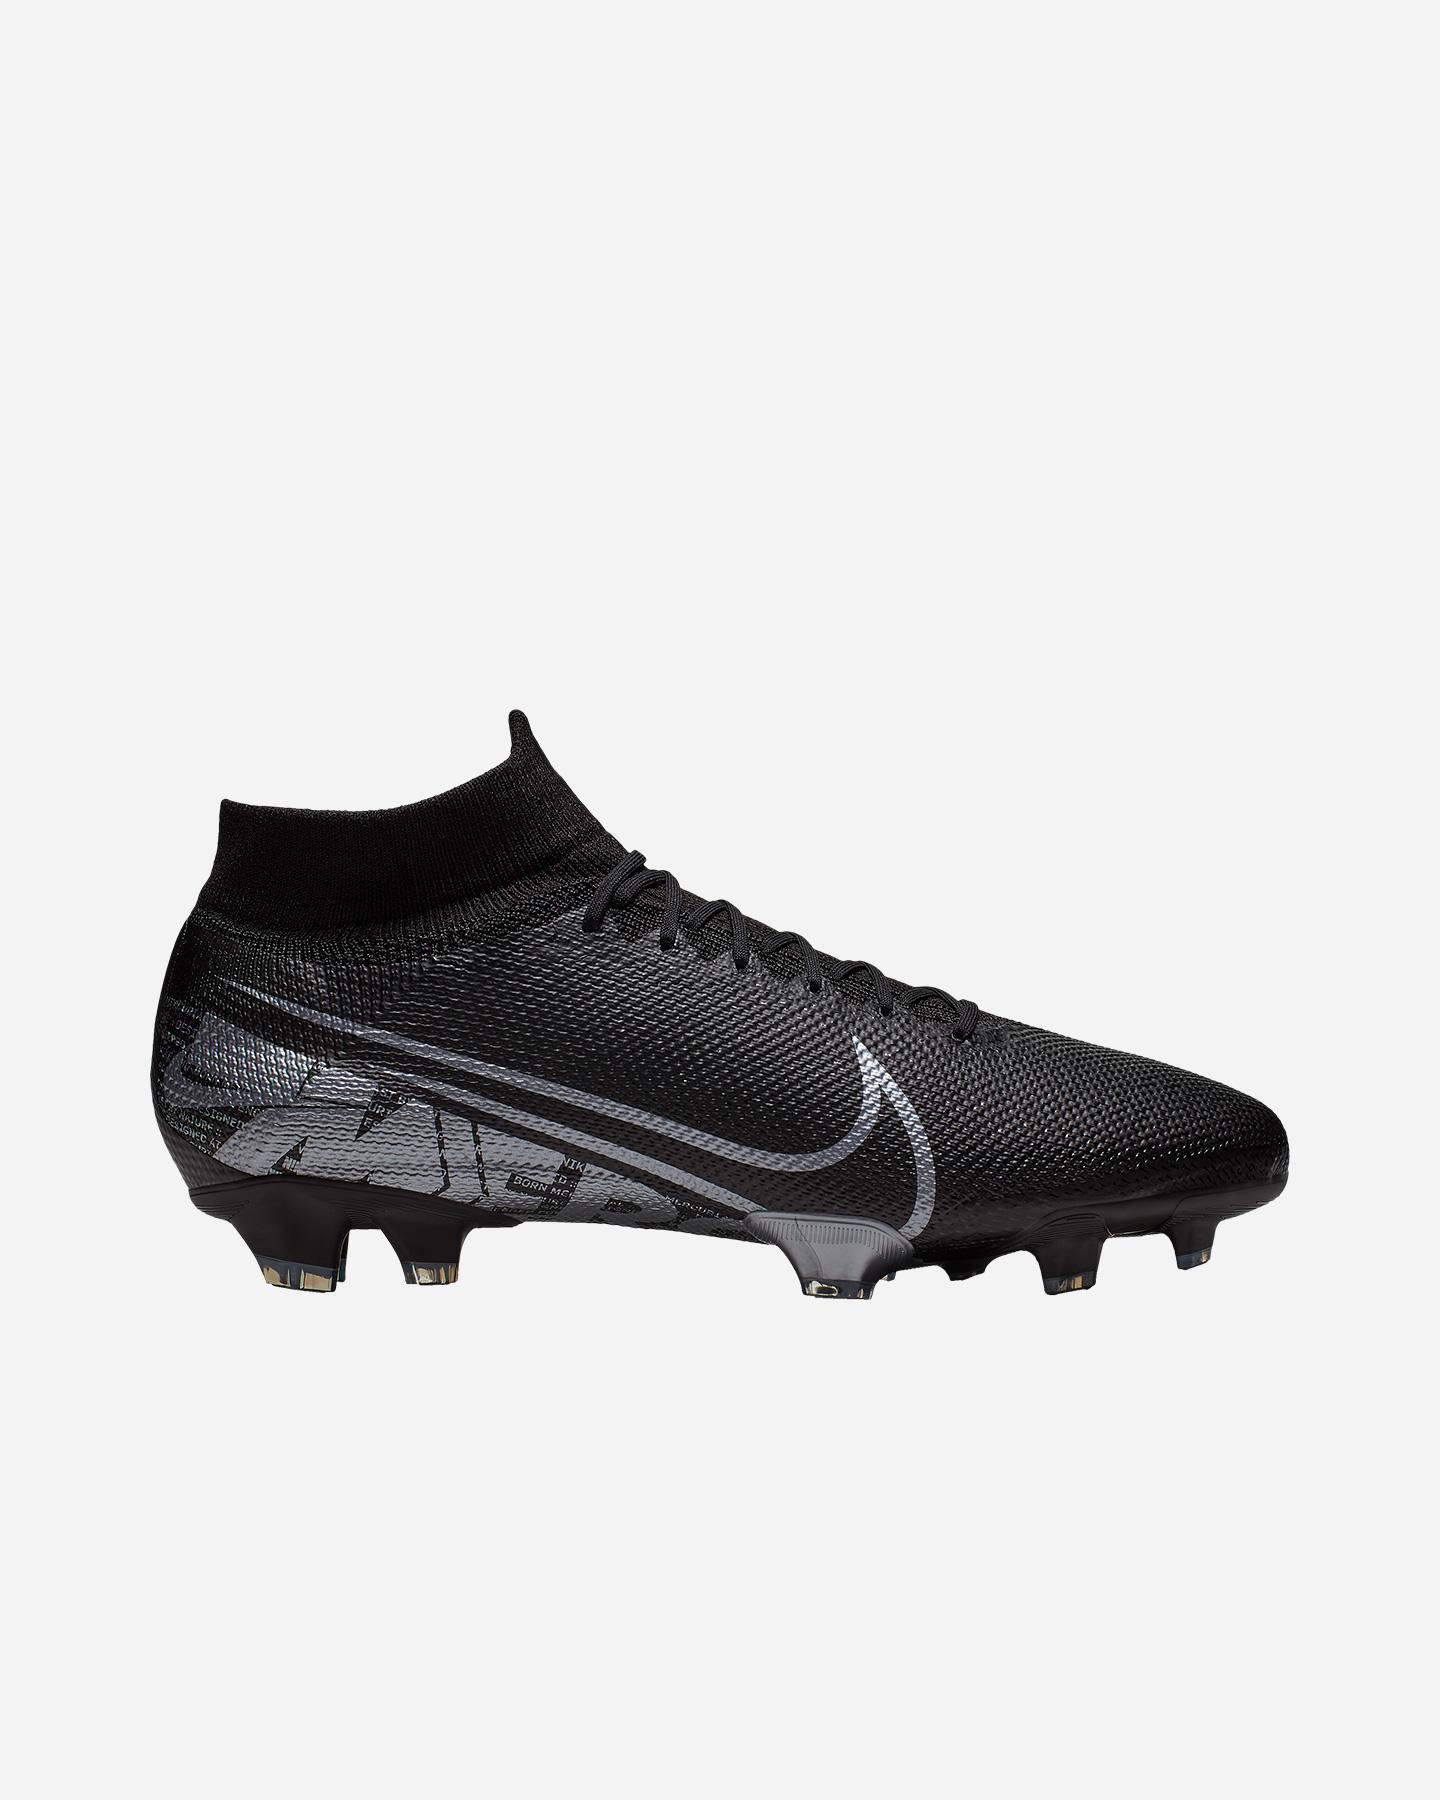 scarpe calcio nike mercurial nuove